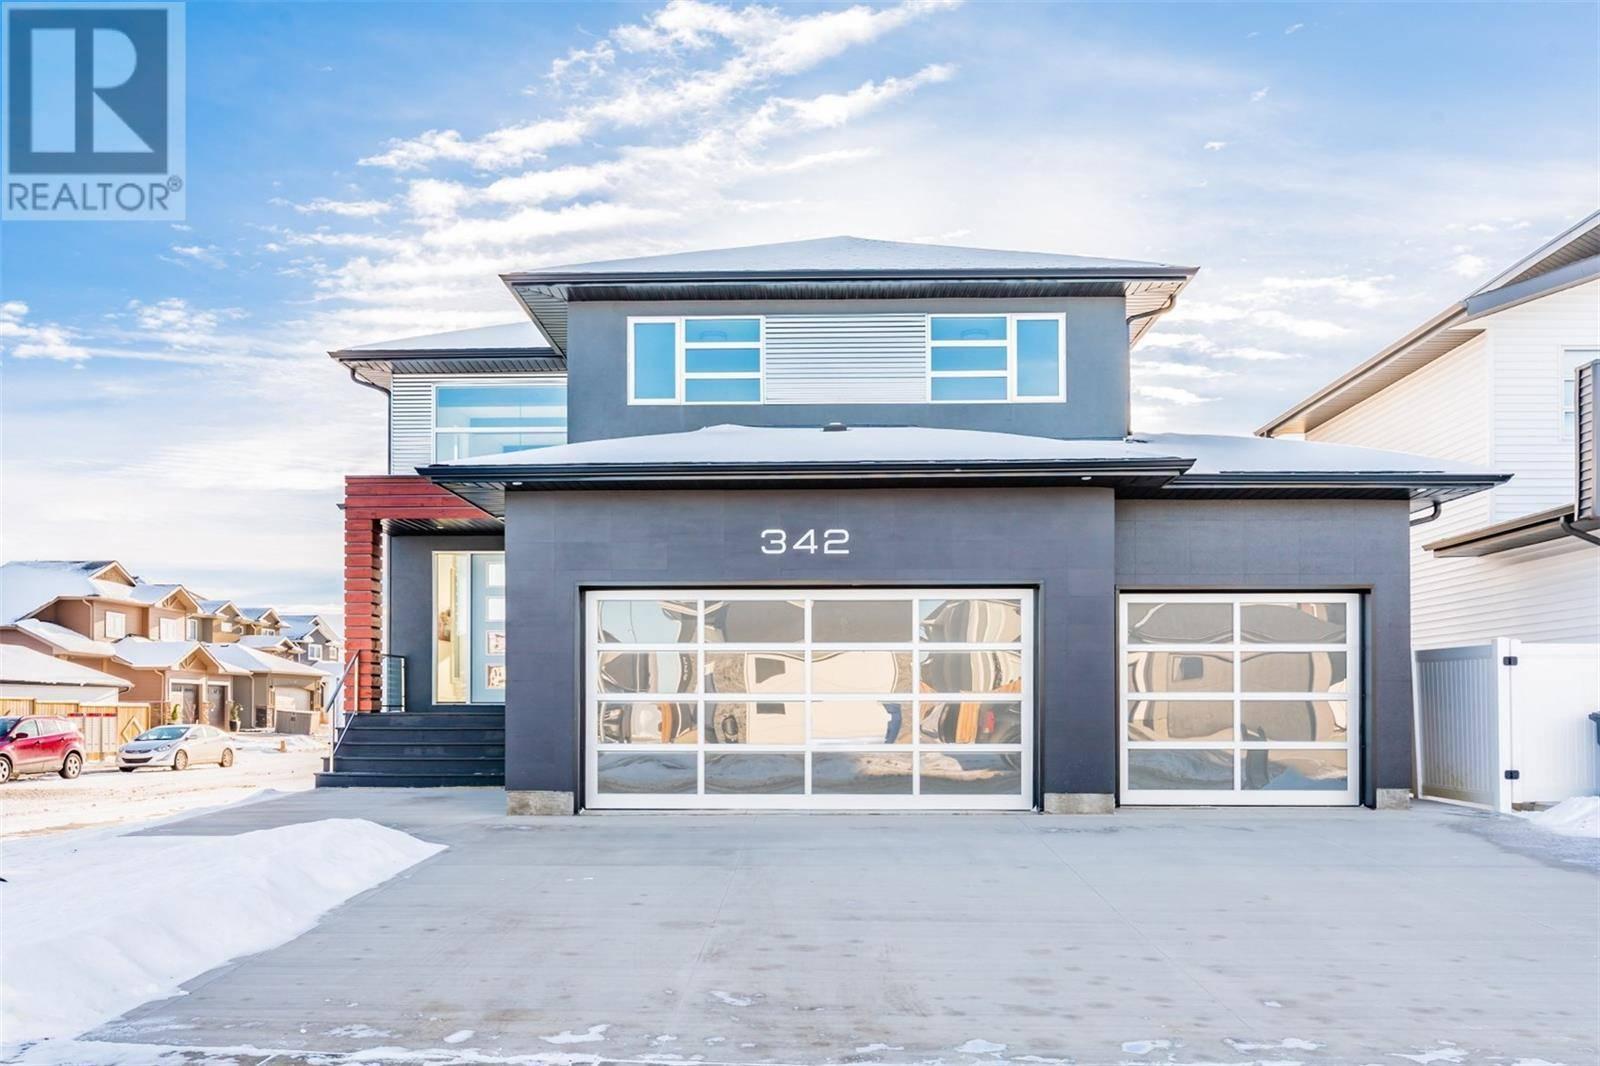 House for sale at 342 Boykowich St Saskatoon Saskatchewan - MLS: SK786893